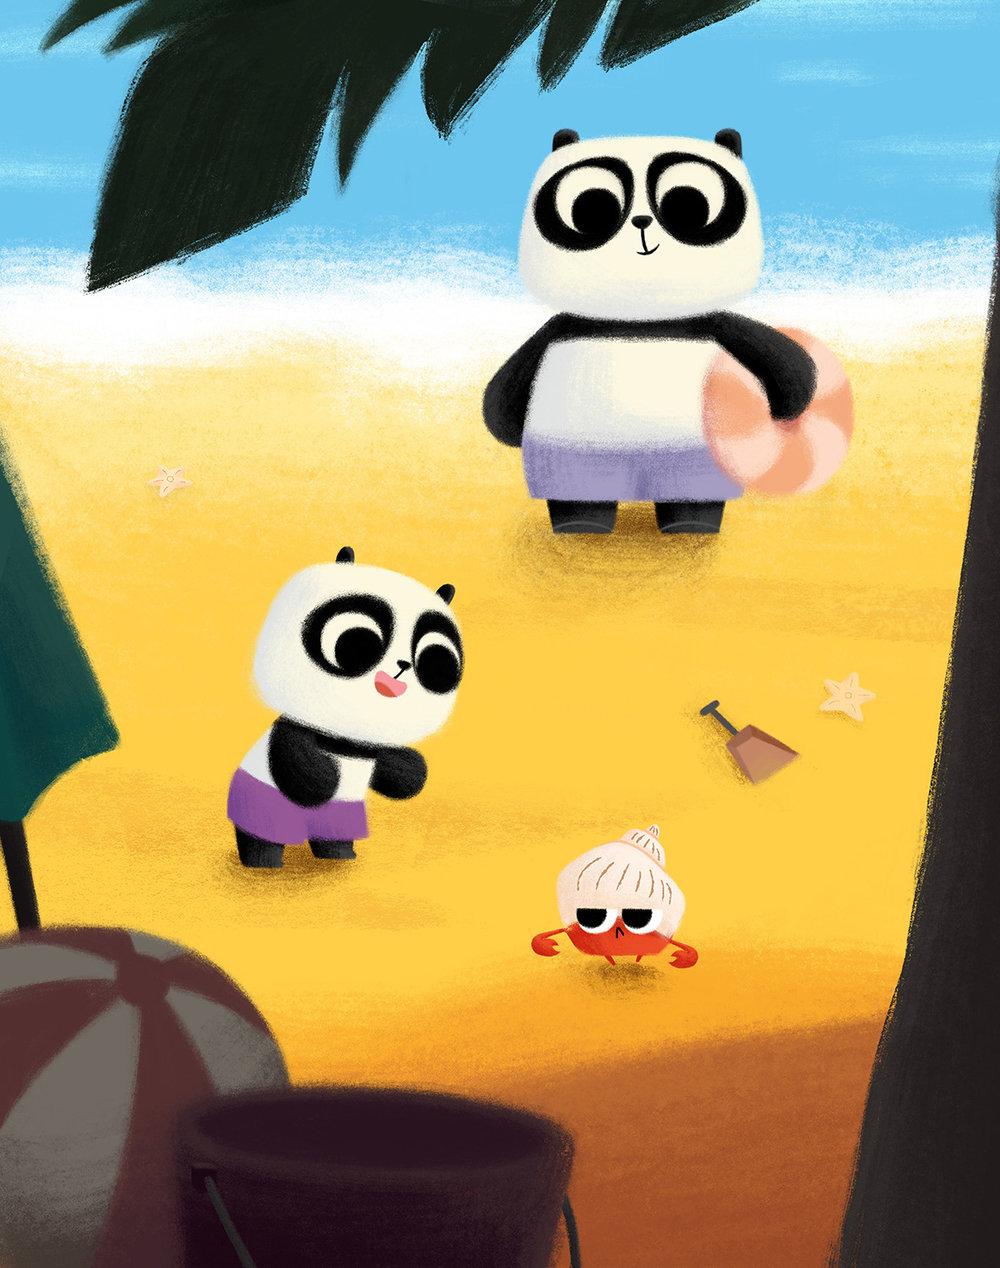 Pandas_on_the_Beach_rgb_s.jpg